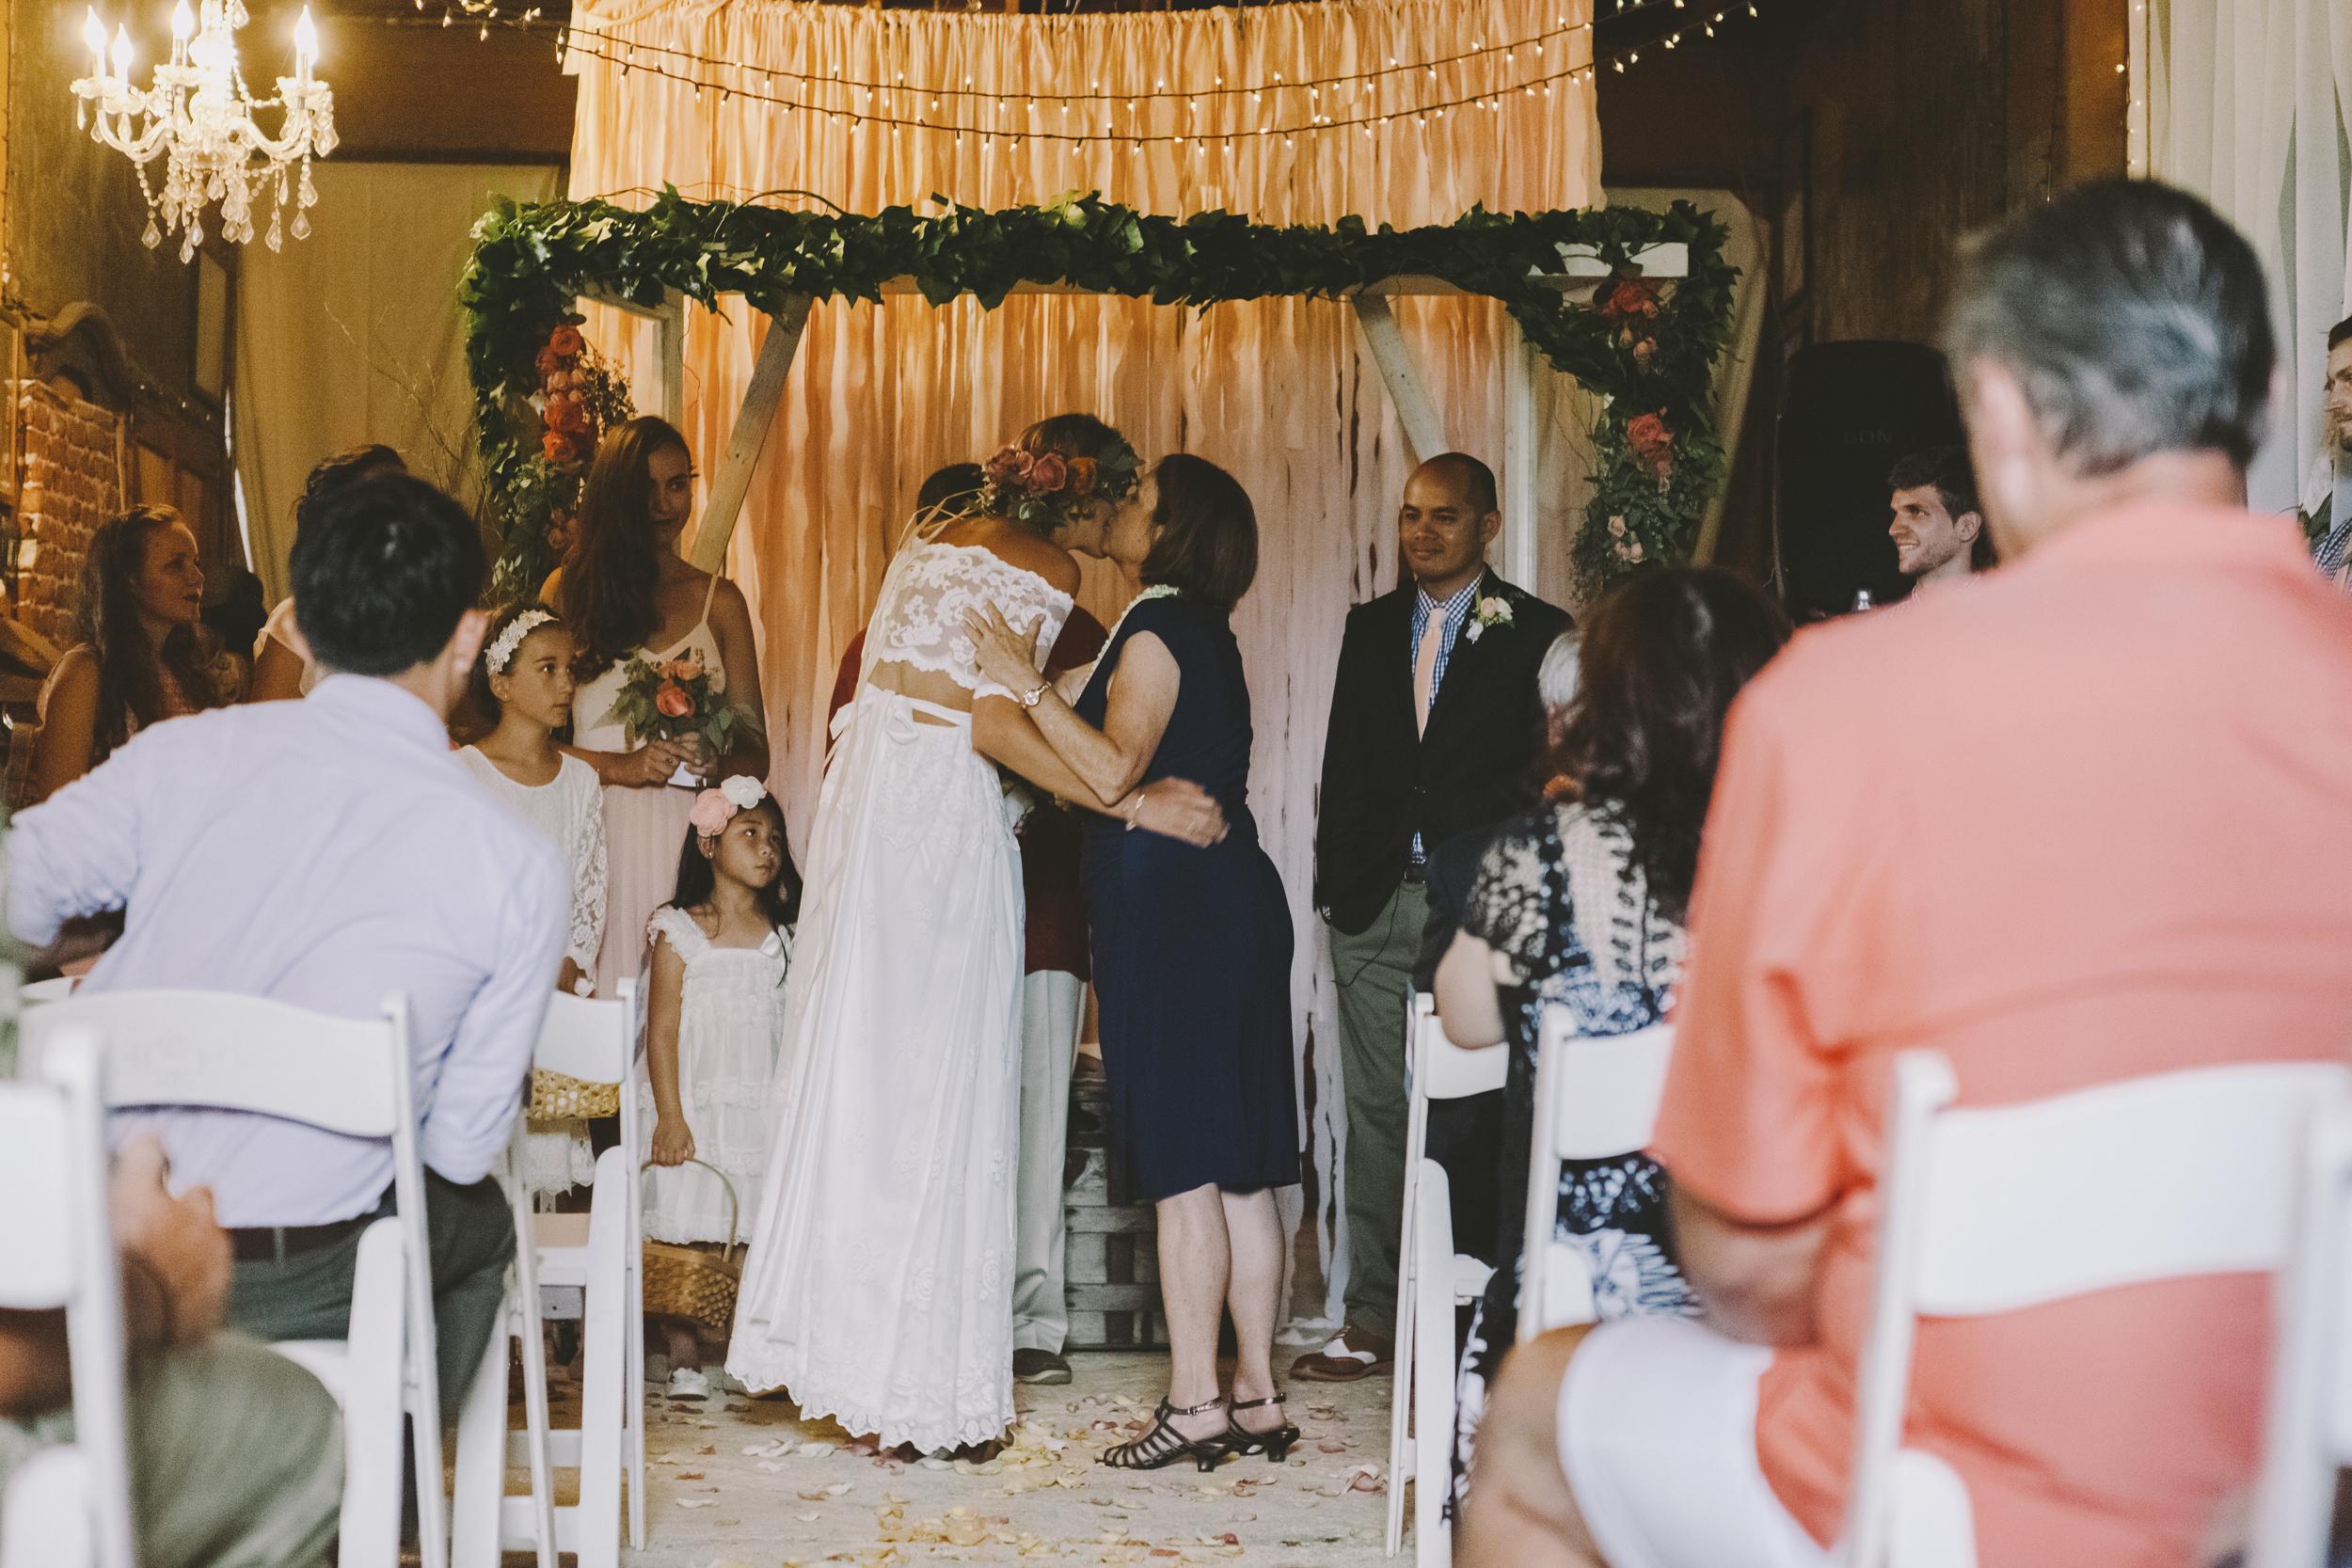 angie-diaz-photography-oahu-hawaii-wedding-tradewinds-ranch-54.jpg